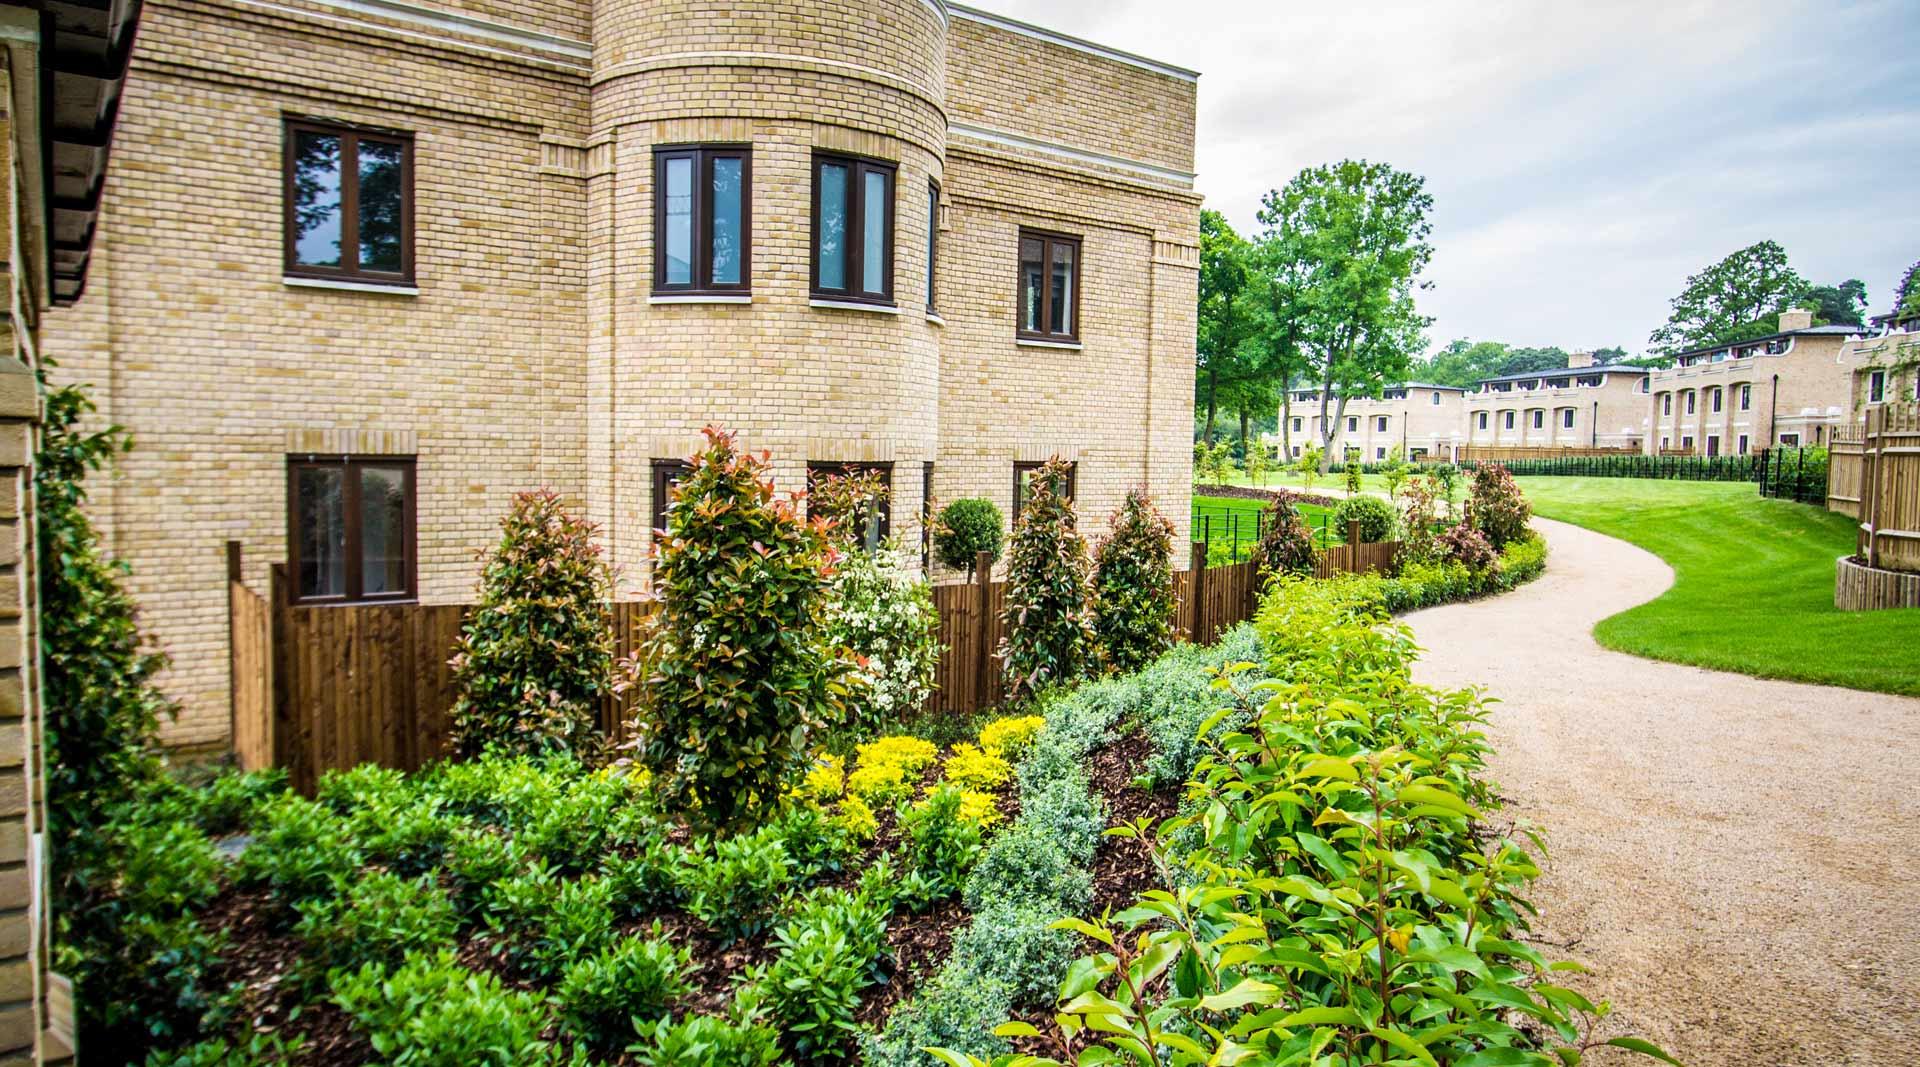 Culture south west home design blog part 9 for Award winning landscape architects